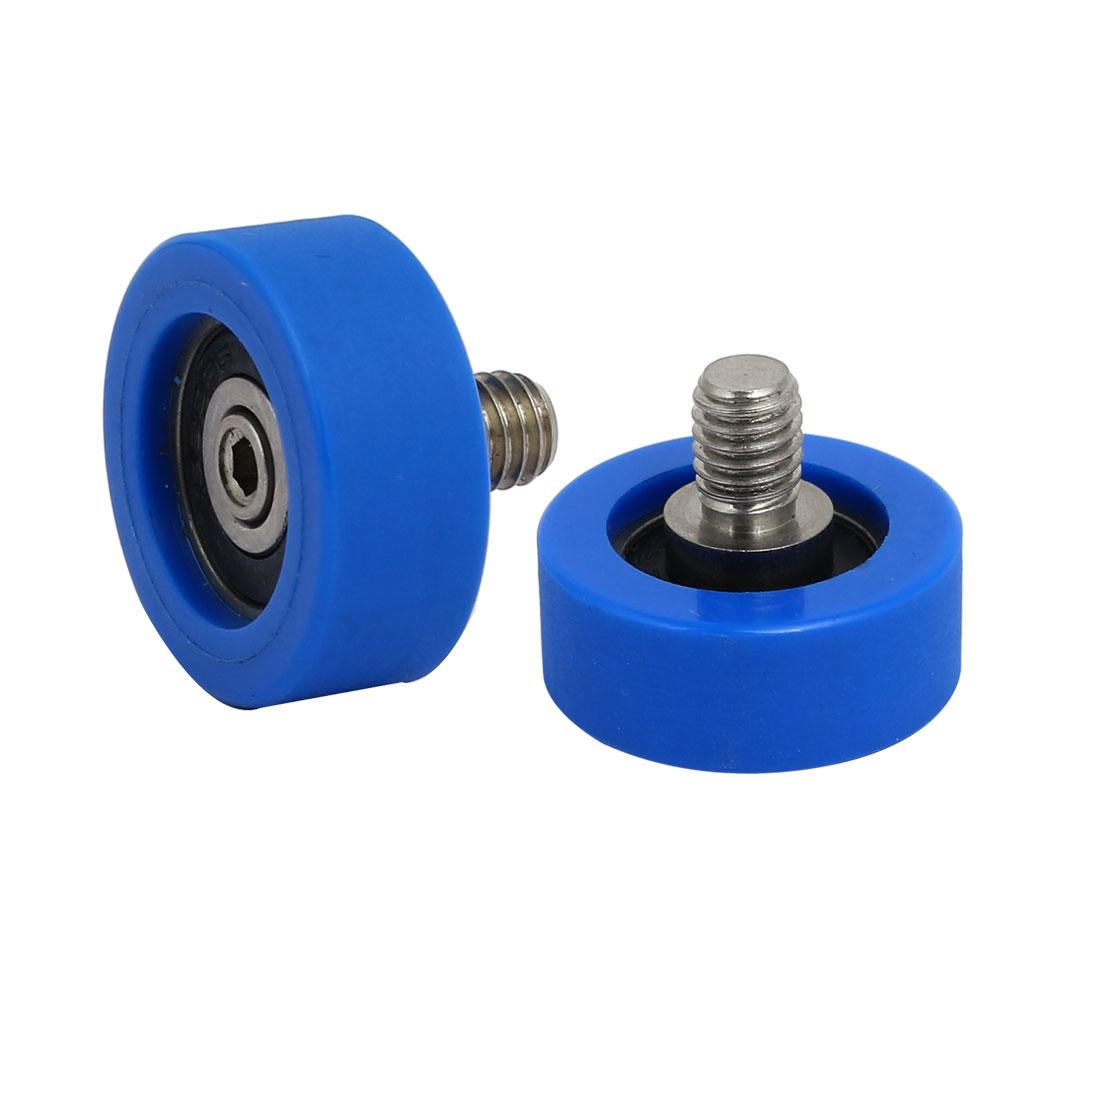 2pcs M6 x 8mm Thread F Type Idler Bearing Pulley Blue 5mm x 22mm x 9mm